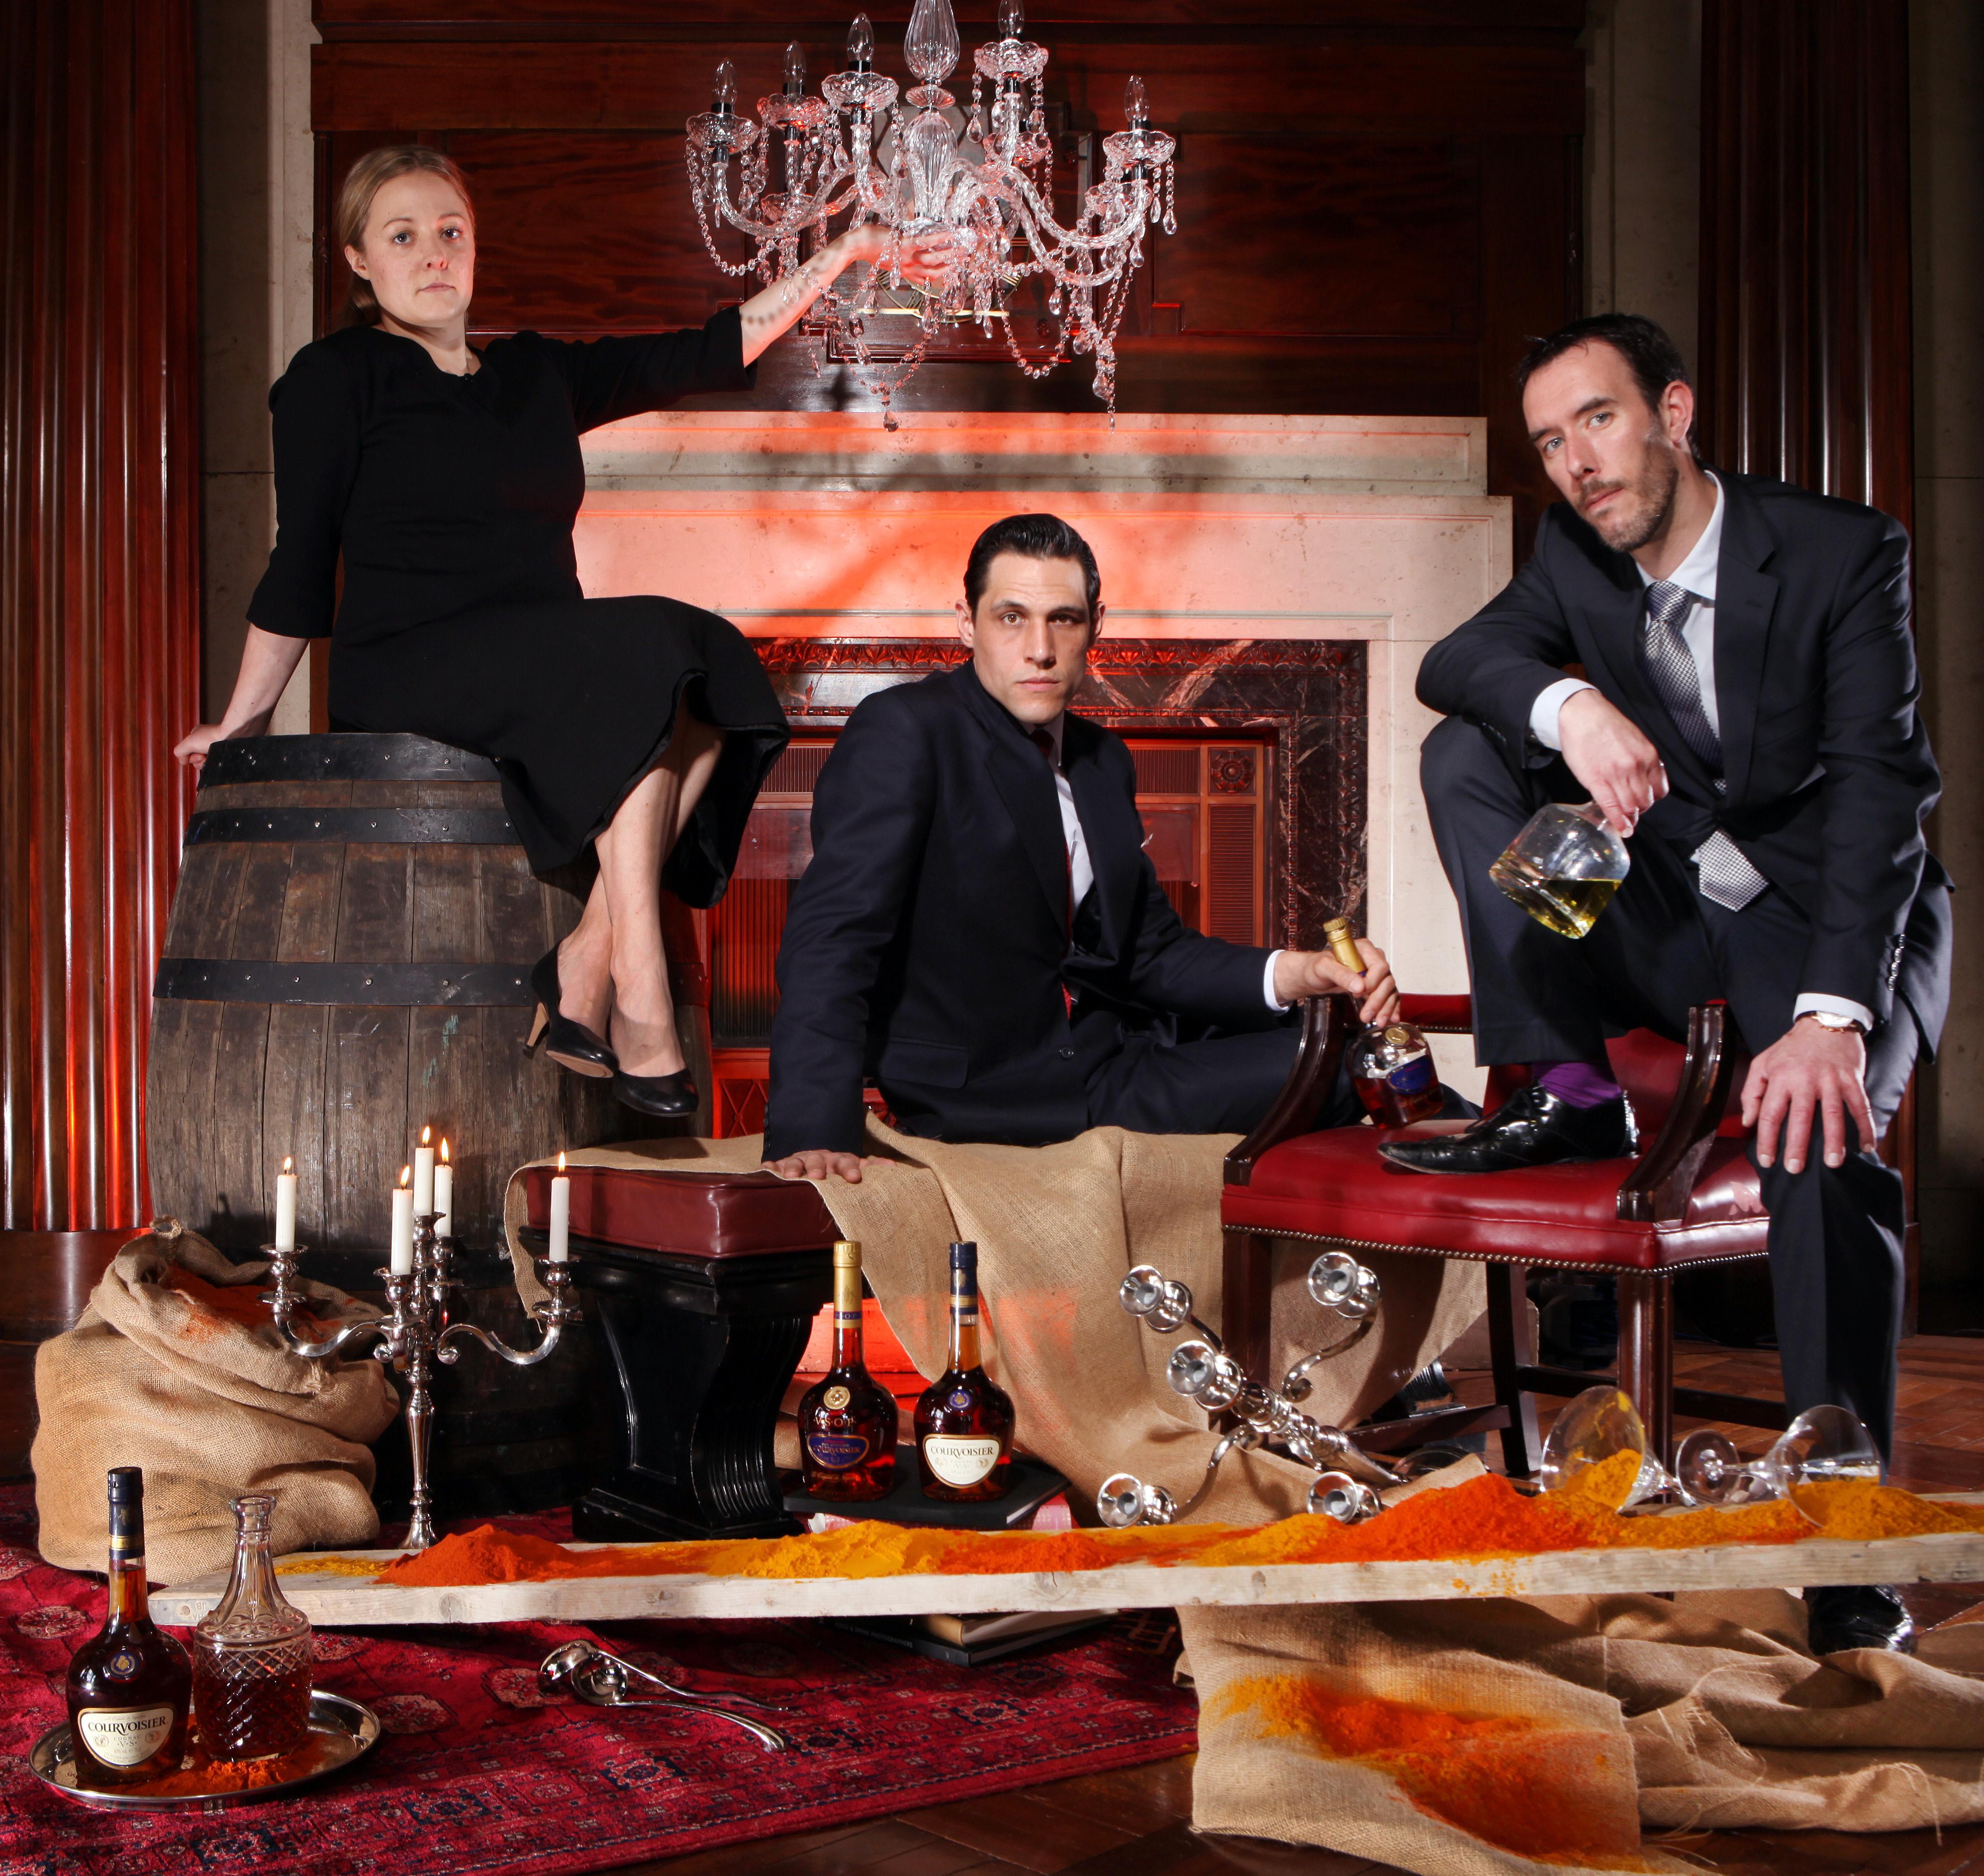 Courvoisier brand ambassadors.